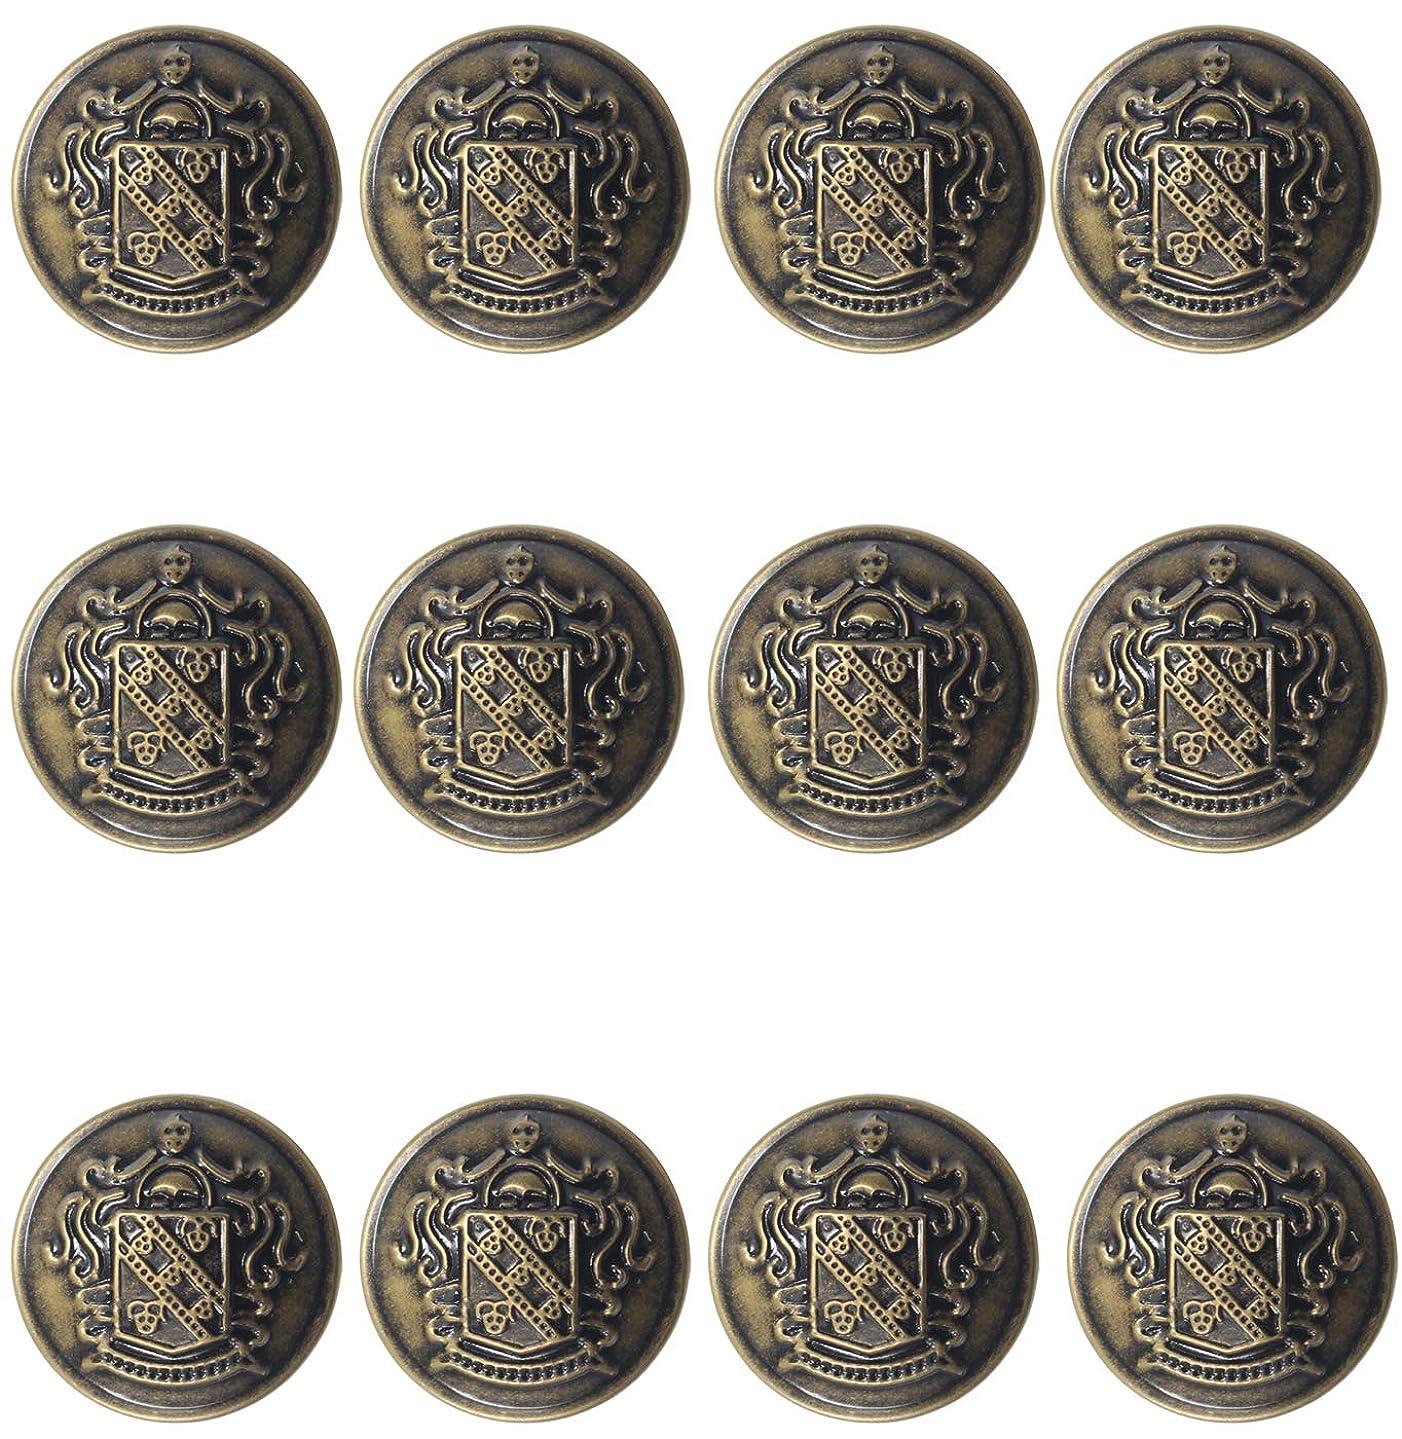 12 Piece Metal Blazer Button Set - for Blazer, Suits, Sport Coat, Uniform, Jacket 25mm(Bronze)